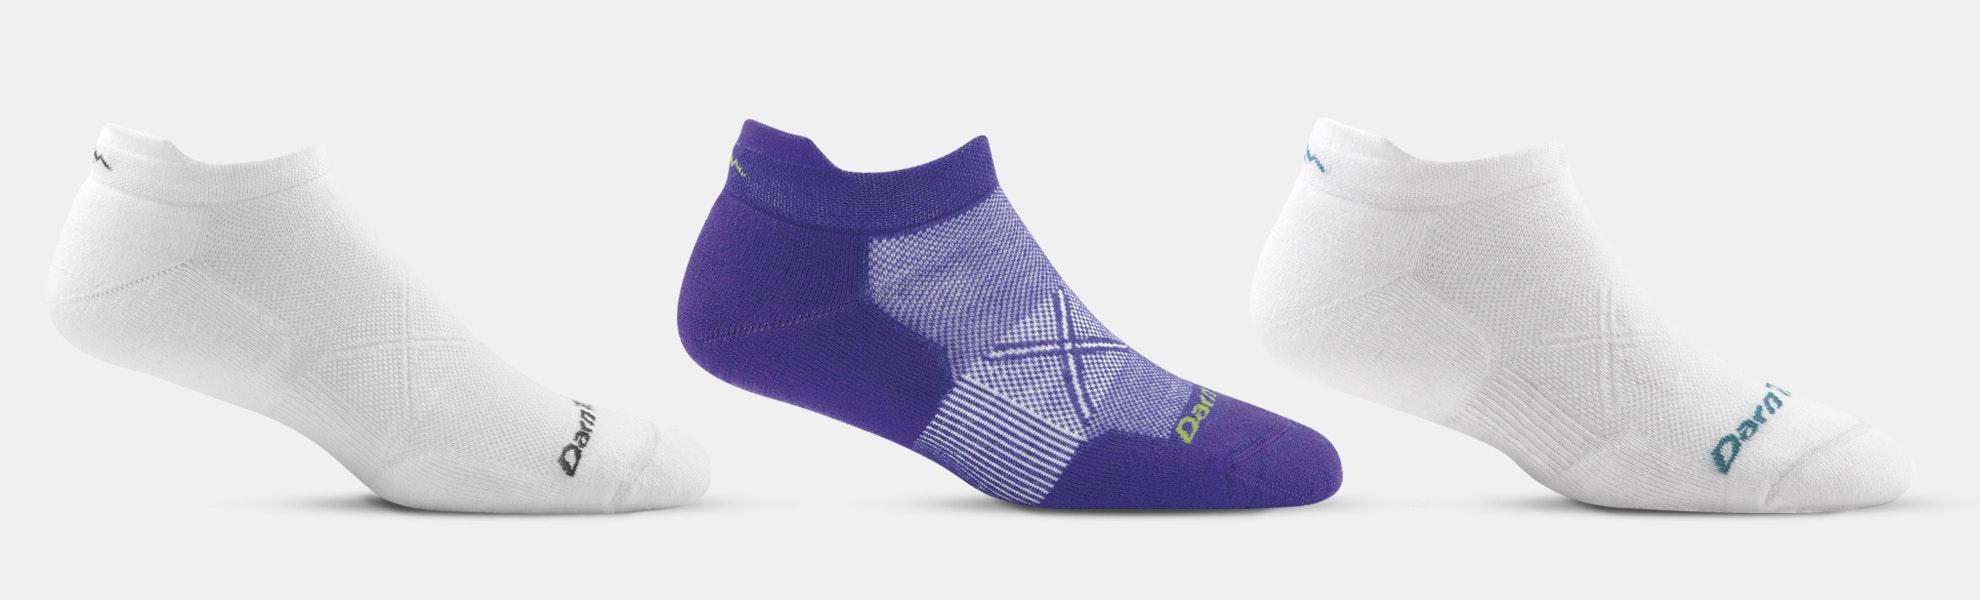 Darn Tough Vertex No-Show Running Socks (2-Pack)